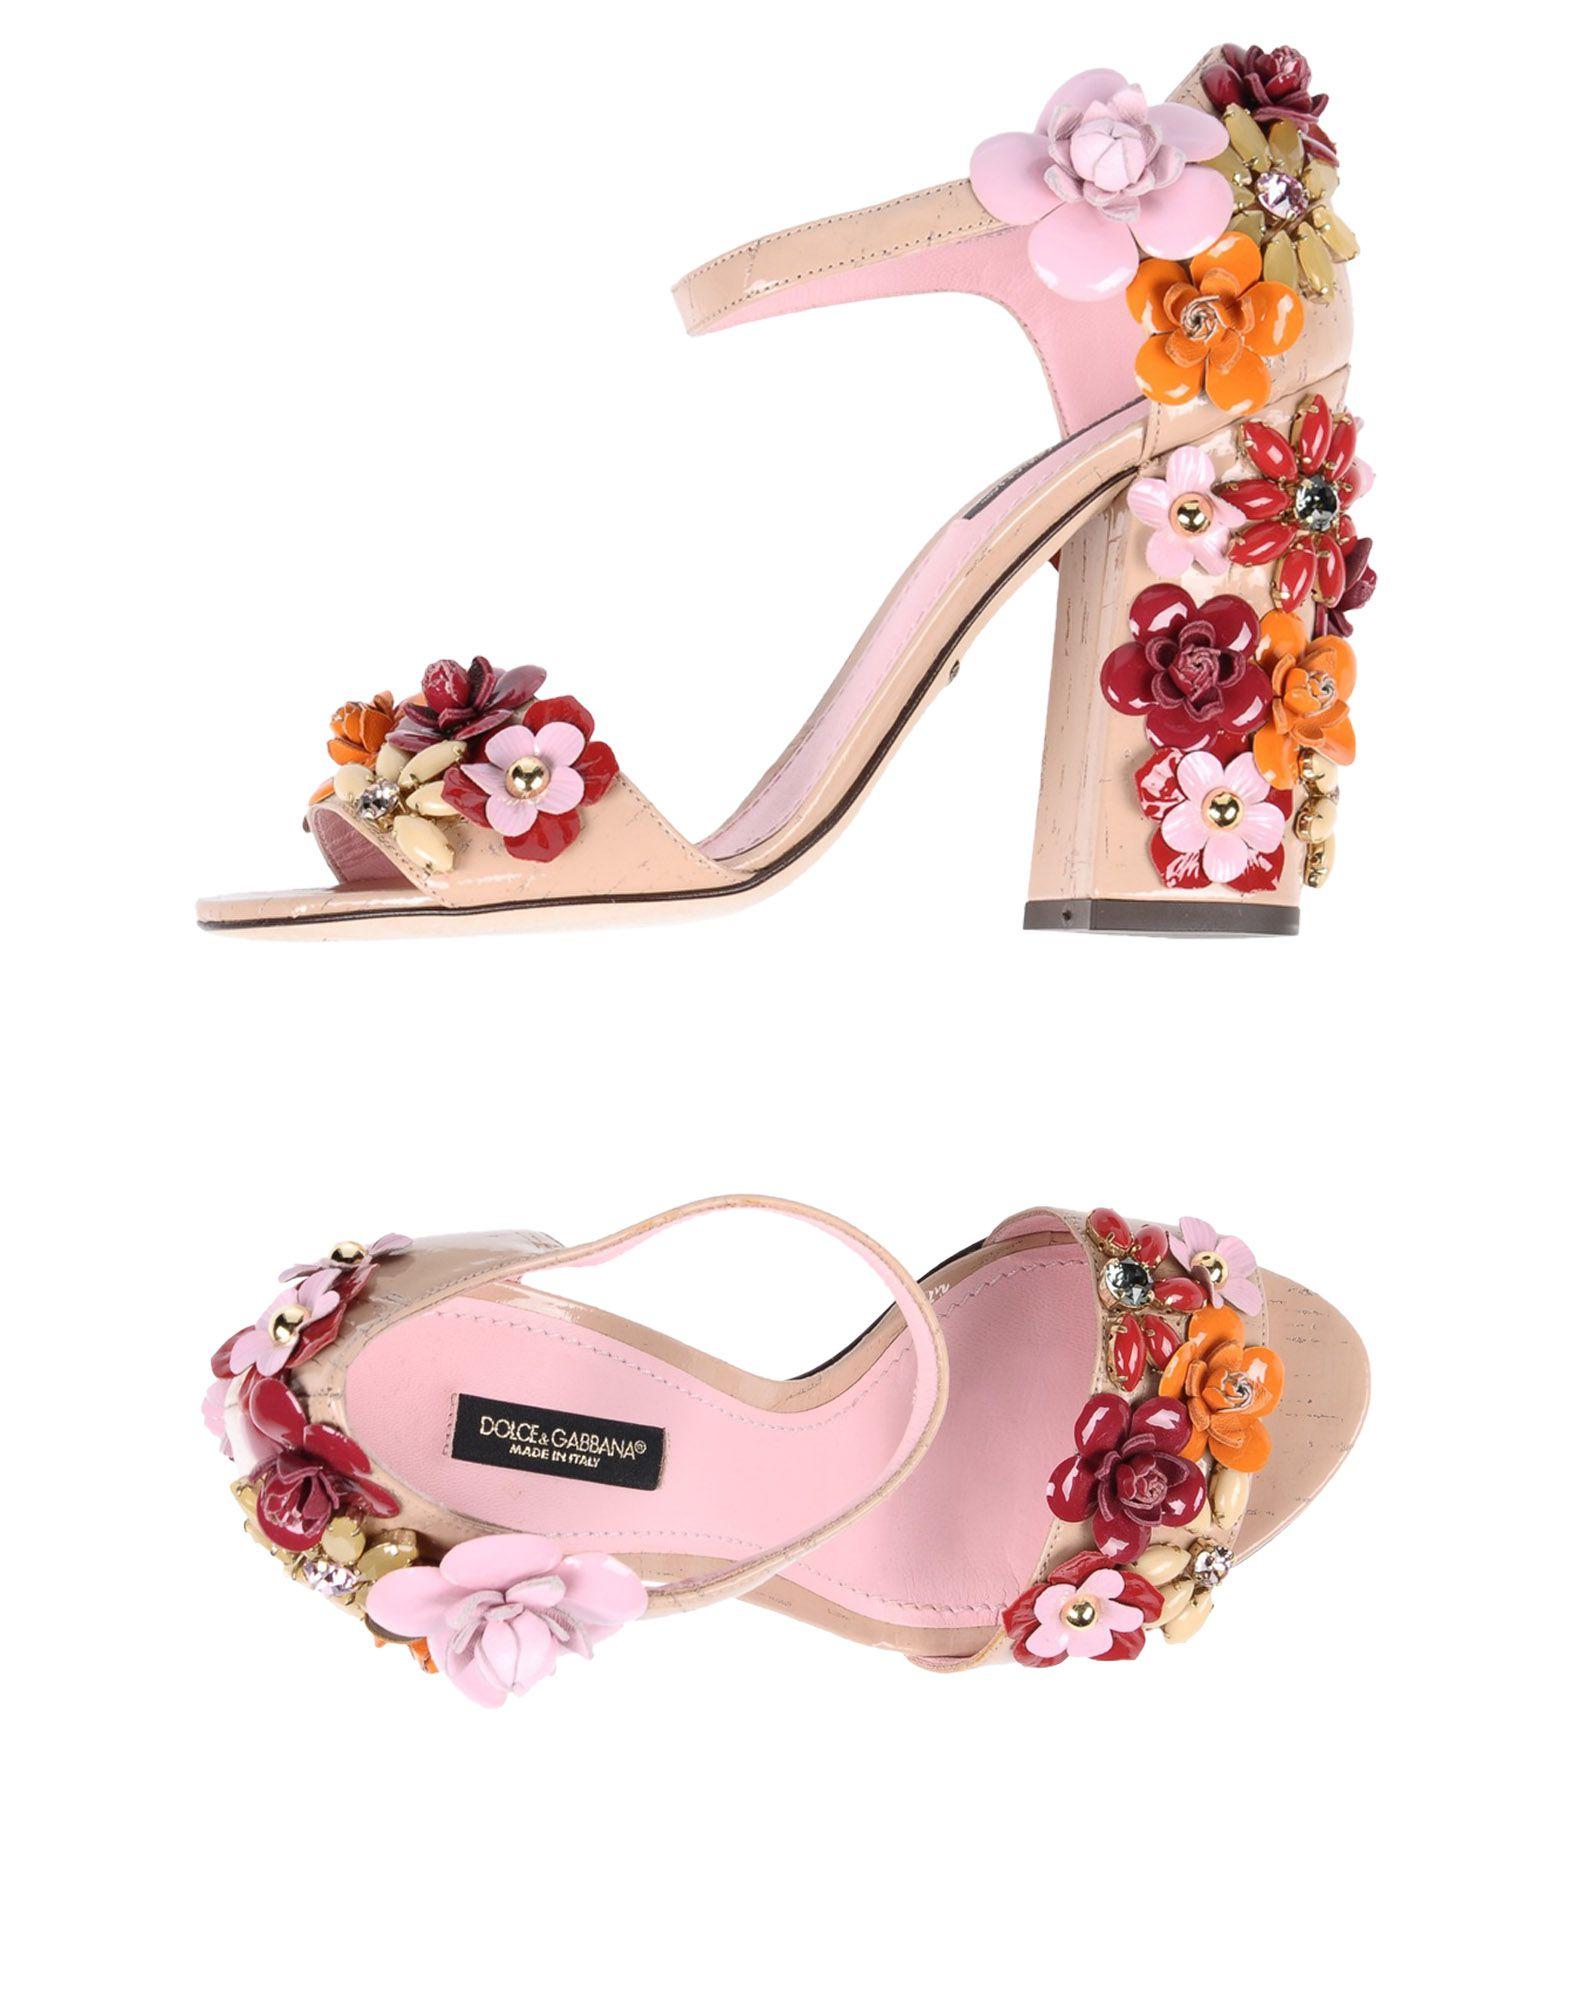 Dolce Dolce Dolce & Gabbana Sandals - Women Dolce & Gabbana Sandals online on  United Kingdom - 11508388VM 41c7e7